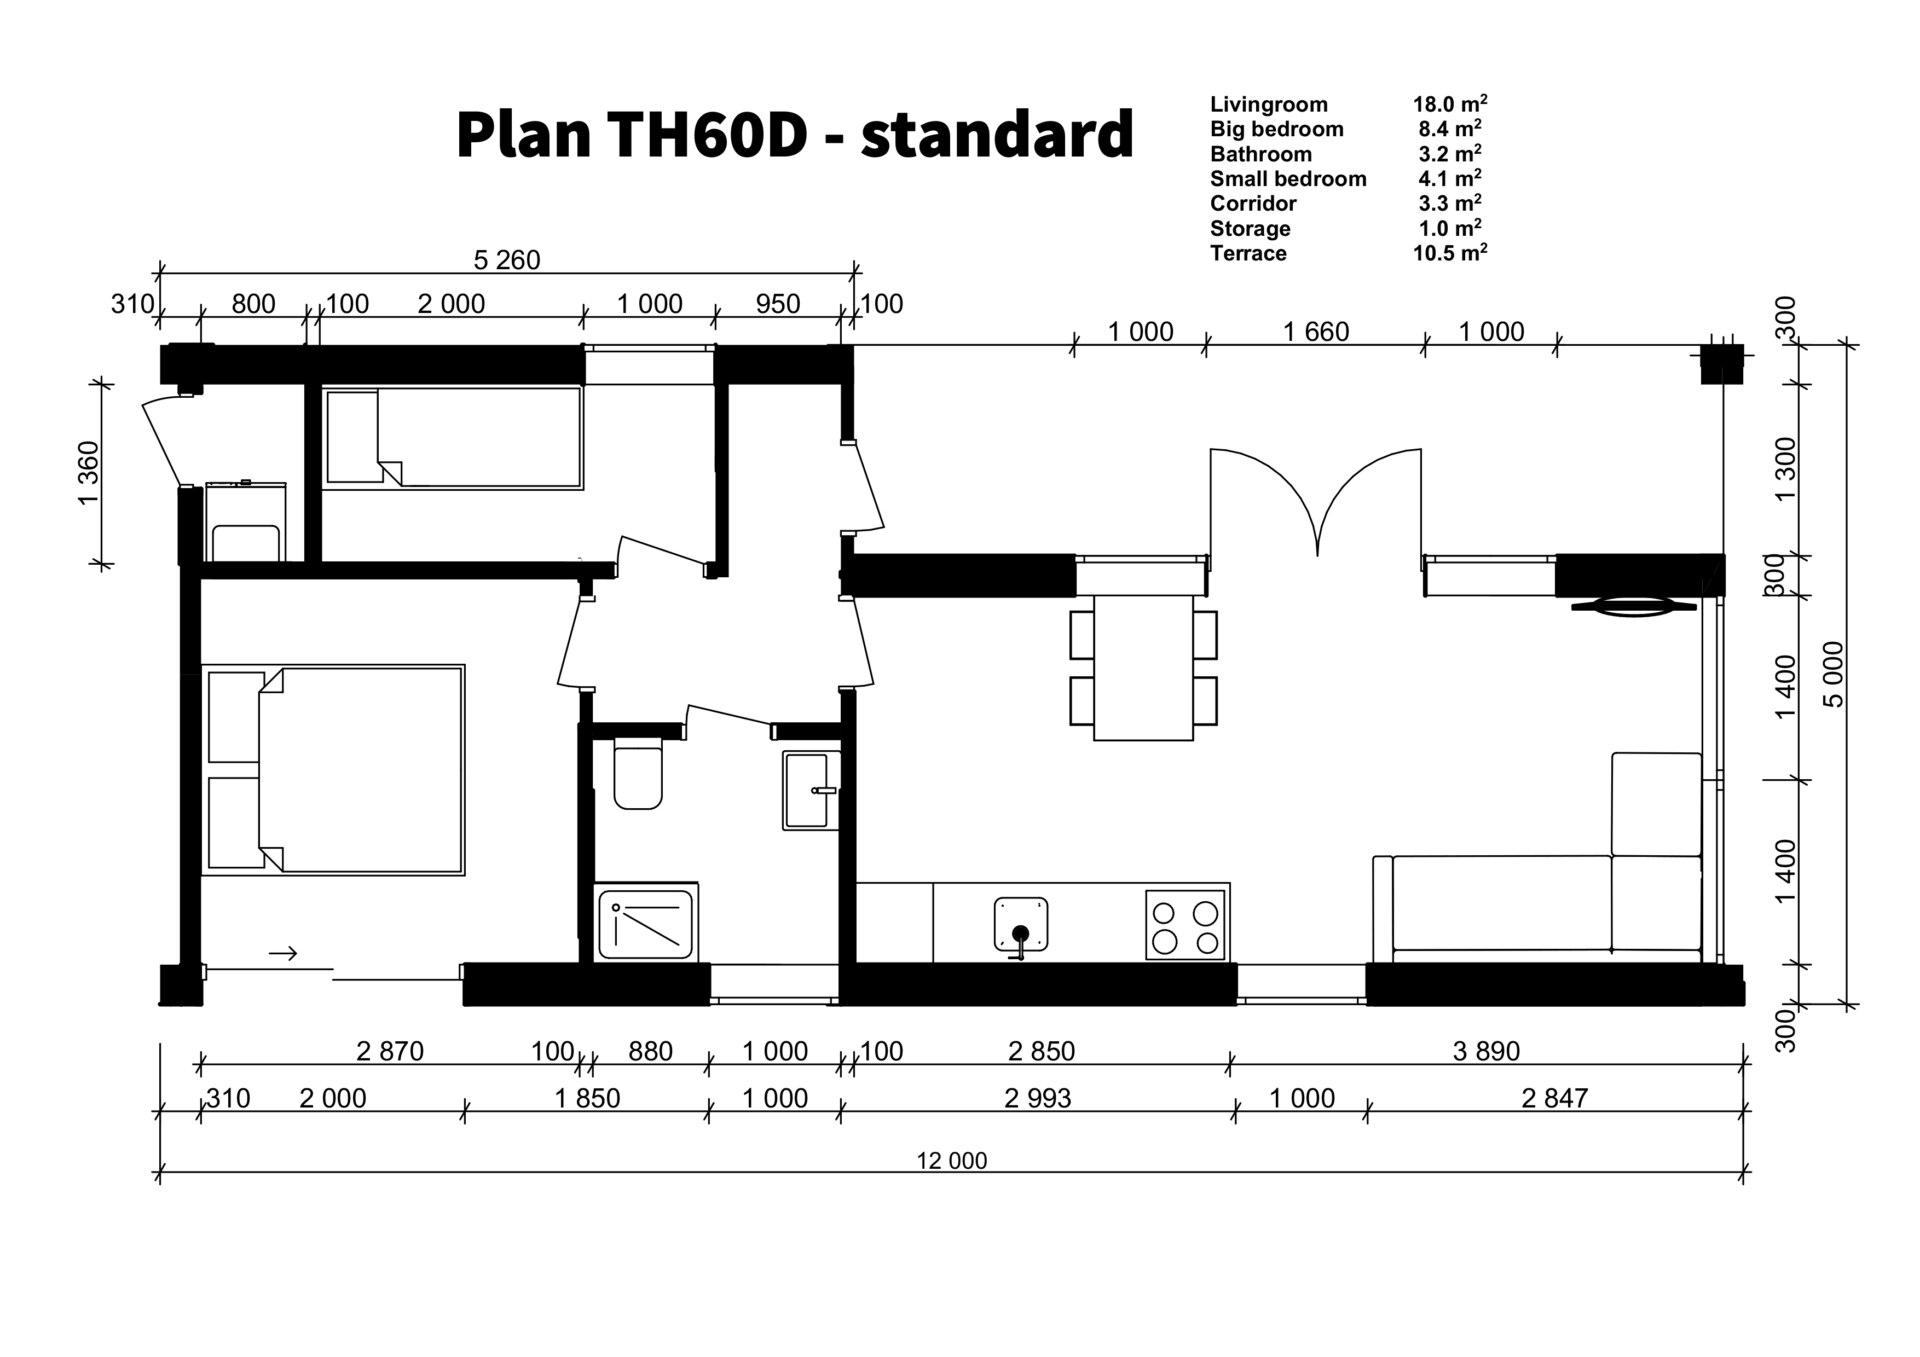 TH60D - standard plan